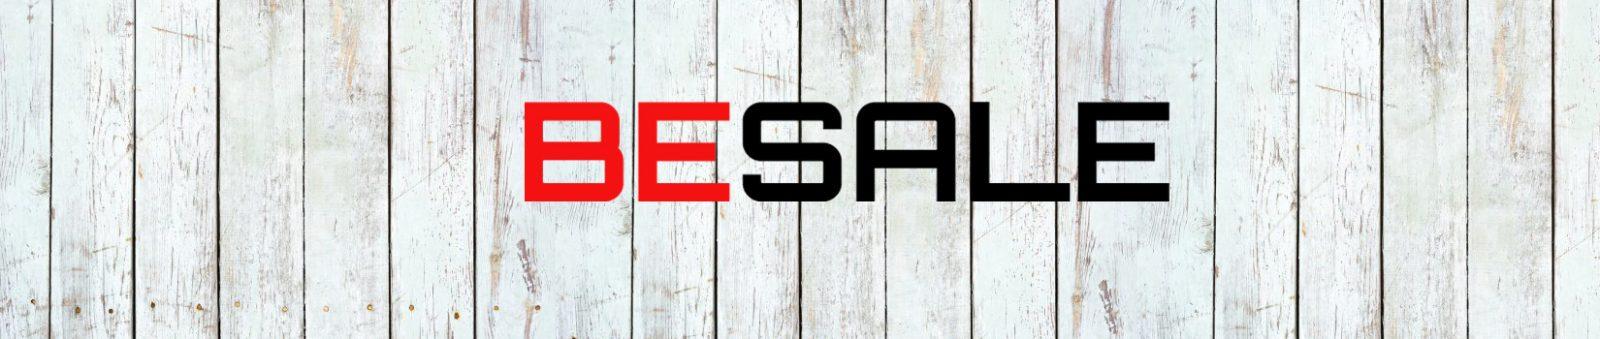 BeSale объявления